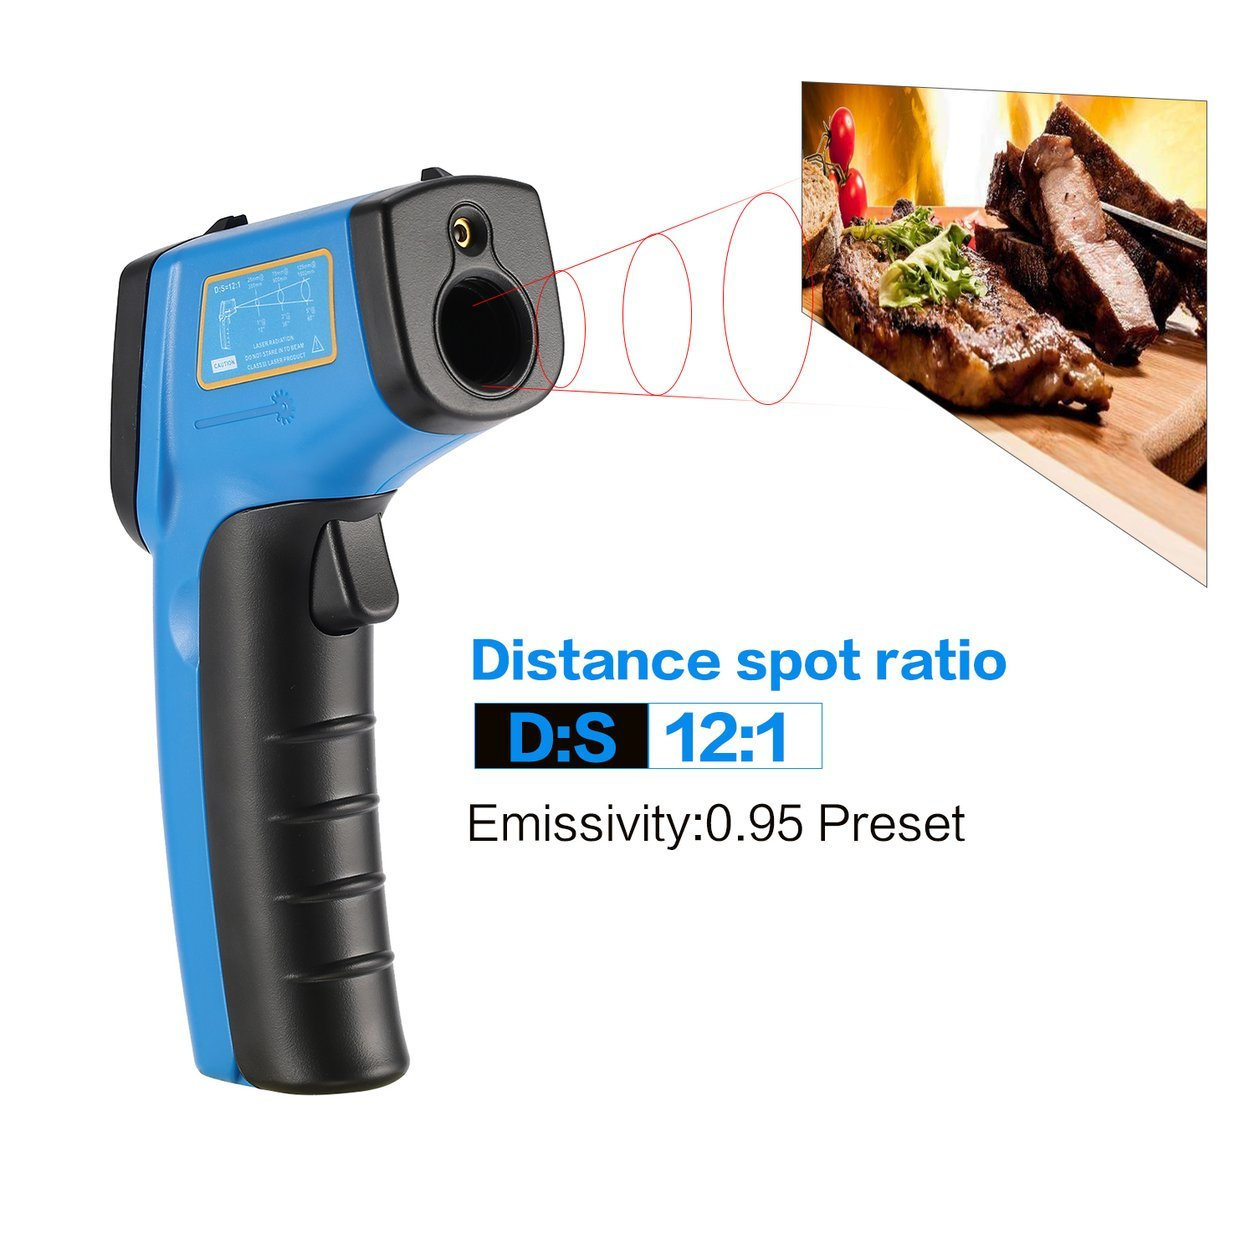 Dailyinshop BENETECH Digital GM321 Termometro a infrarossi senza contatto Termometro a infrarossi Temperatura Pirometro IR Laser Point Gun -50~400 ℃ (Colore: blu)